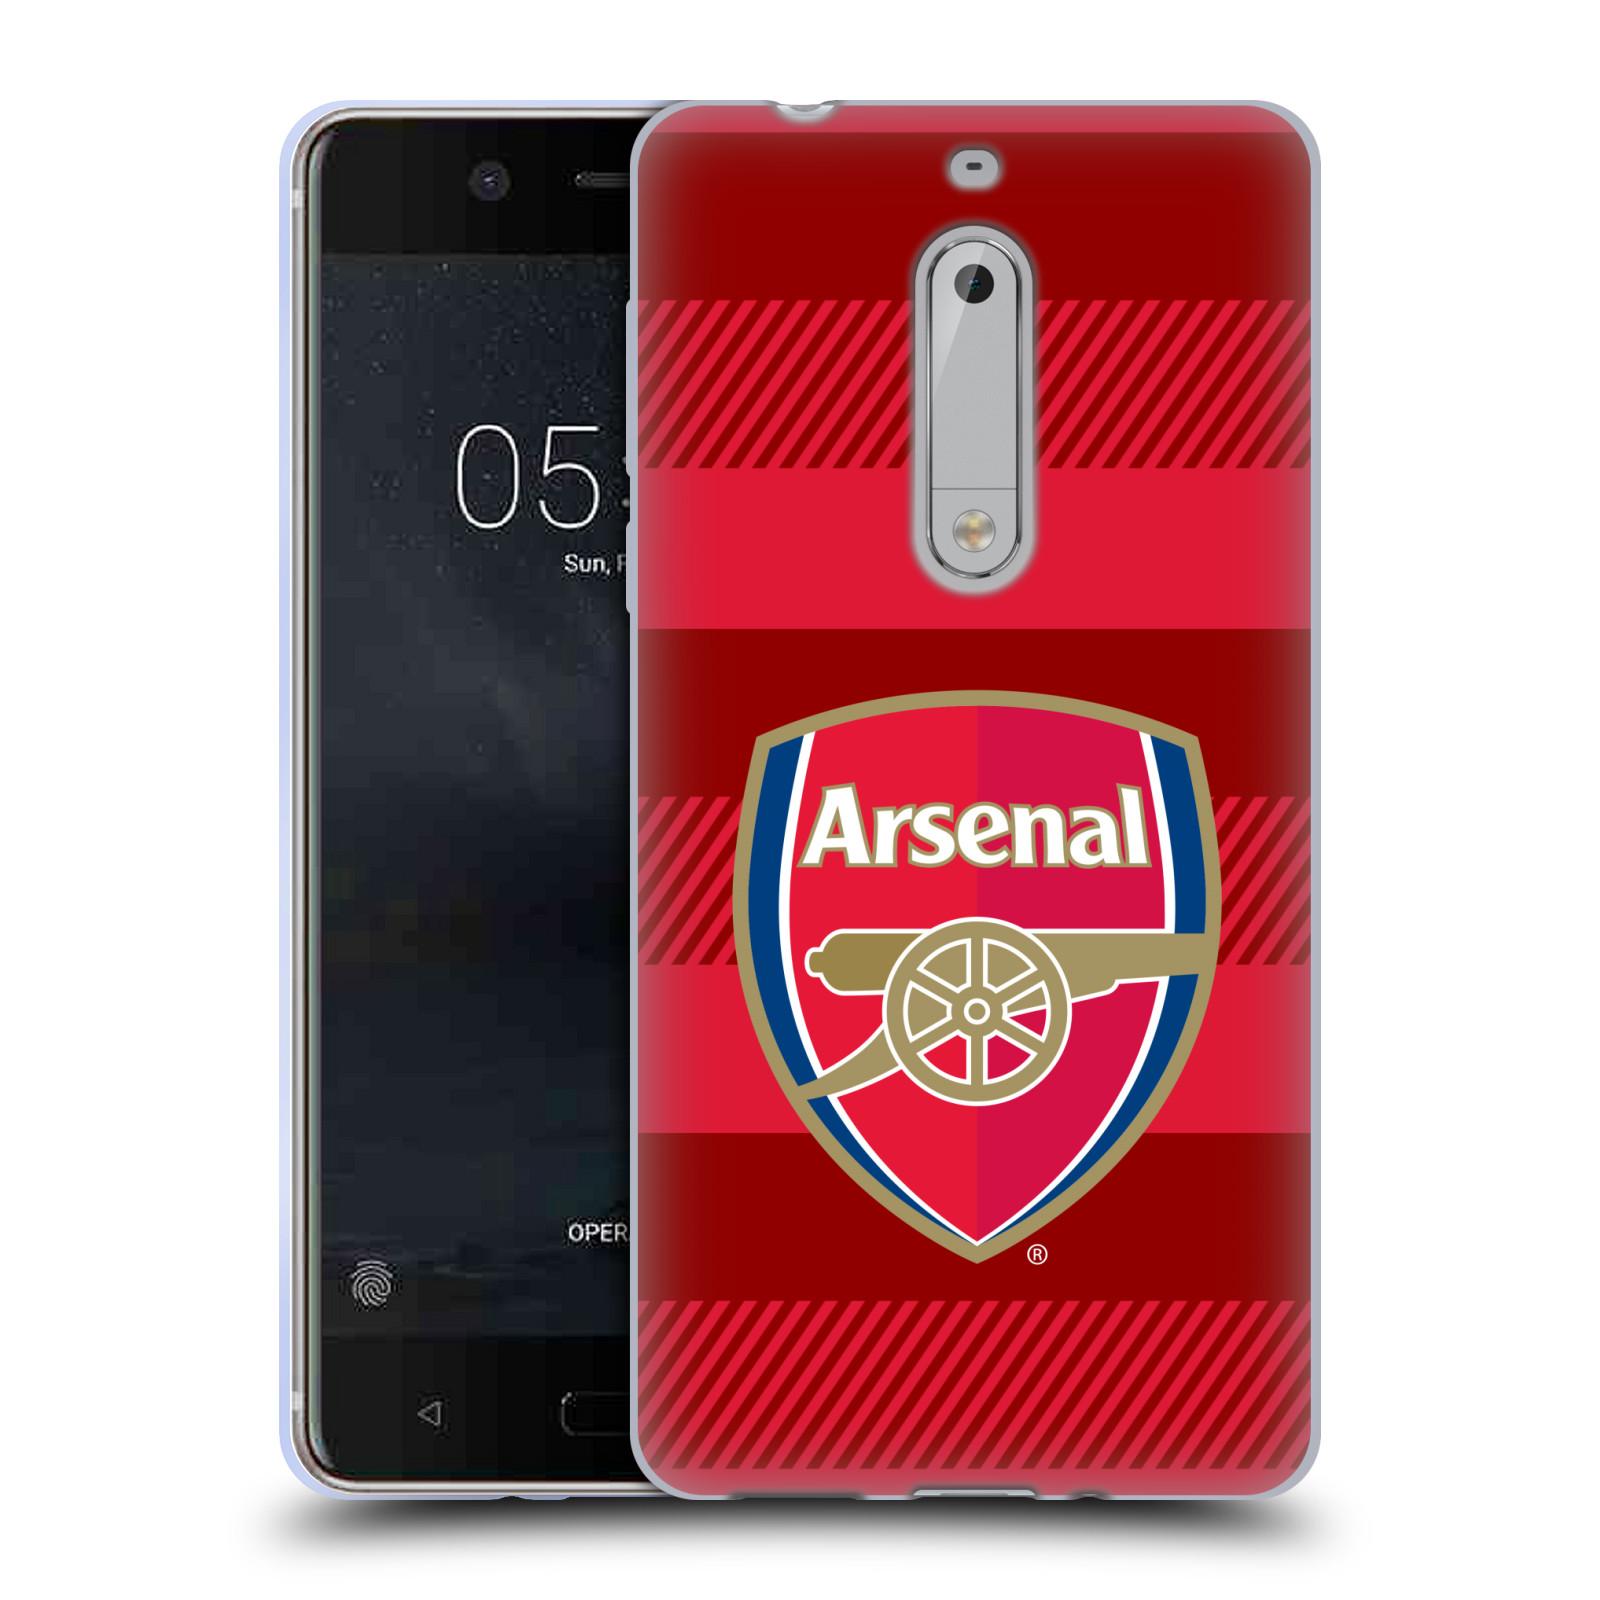 Silikonové pouzdro na mobil Nokia 5 Head Case - Arsenal FC - Logo s pruhy